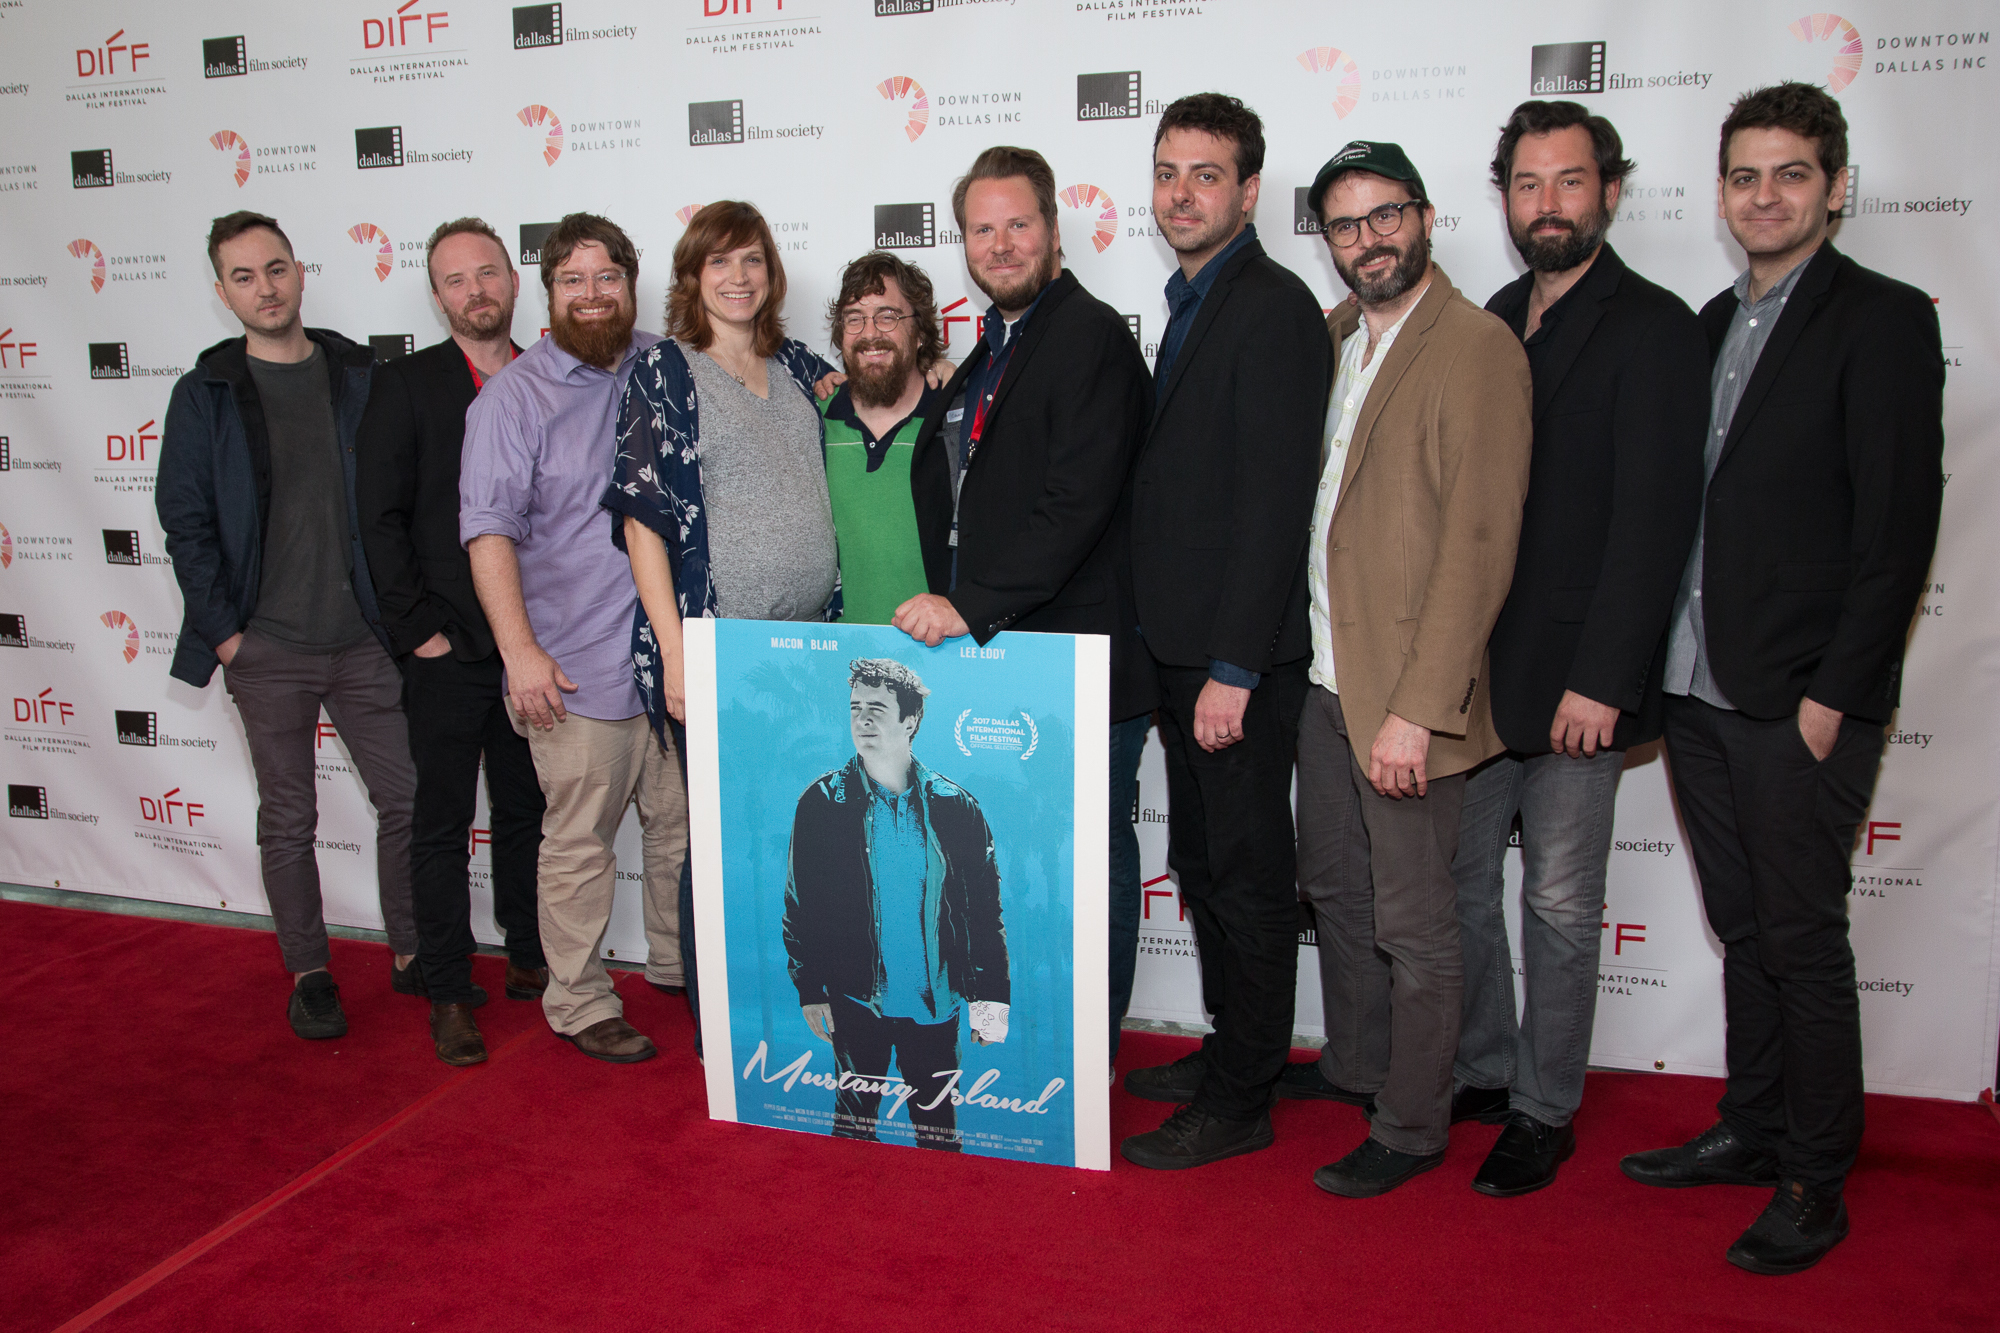 Macon Blair, John Merriman, Jason Newman, Lee Eddy, Craig Elrod, Nathan Smith, Michael Bartnett, Evan Smith, Michael Mobley, and Ben Prosser at an event for Mustang Island (2017)